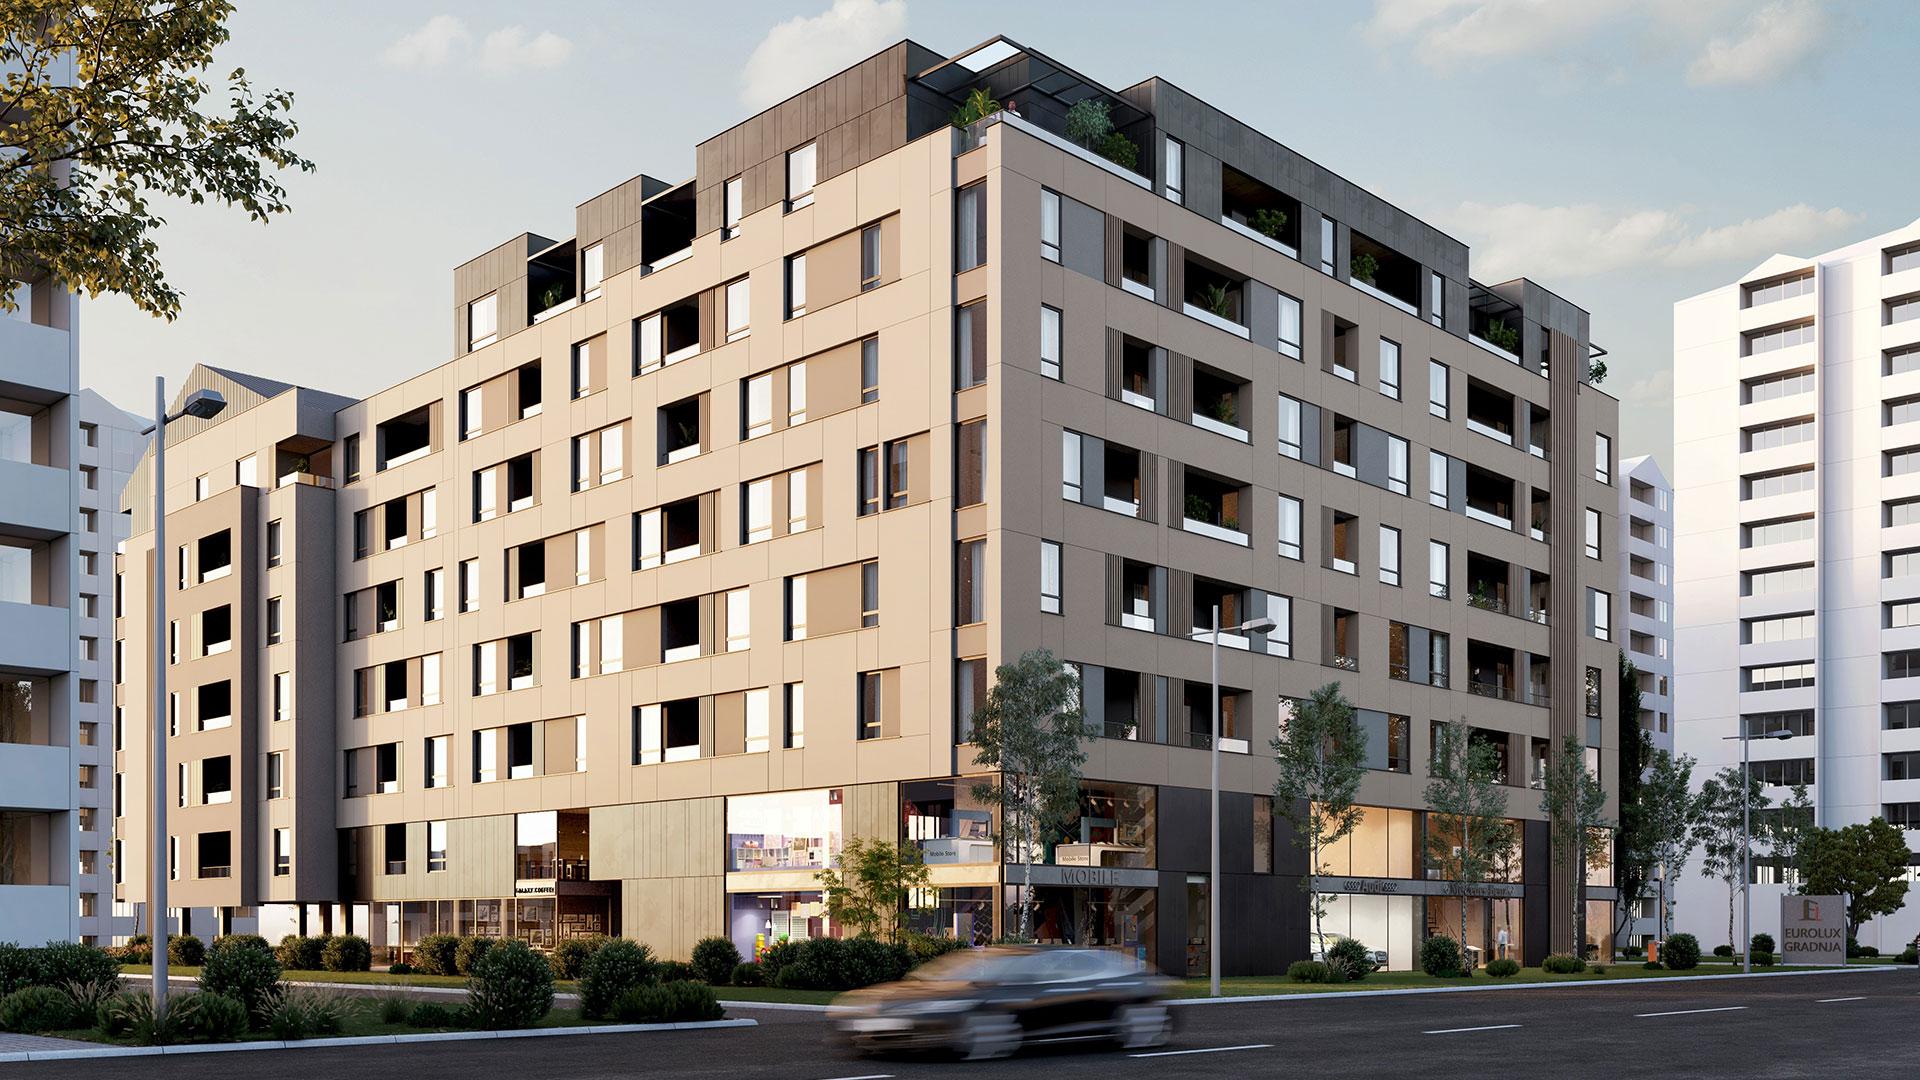 Prodaja stanova Niš - Objekat u Bulevar Nemanjića bb 4